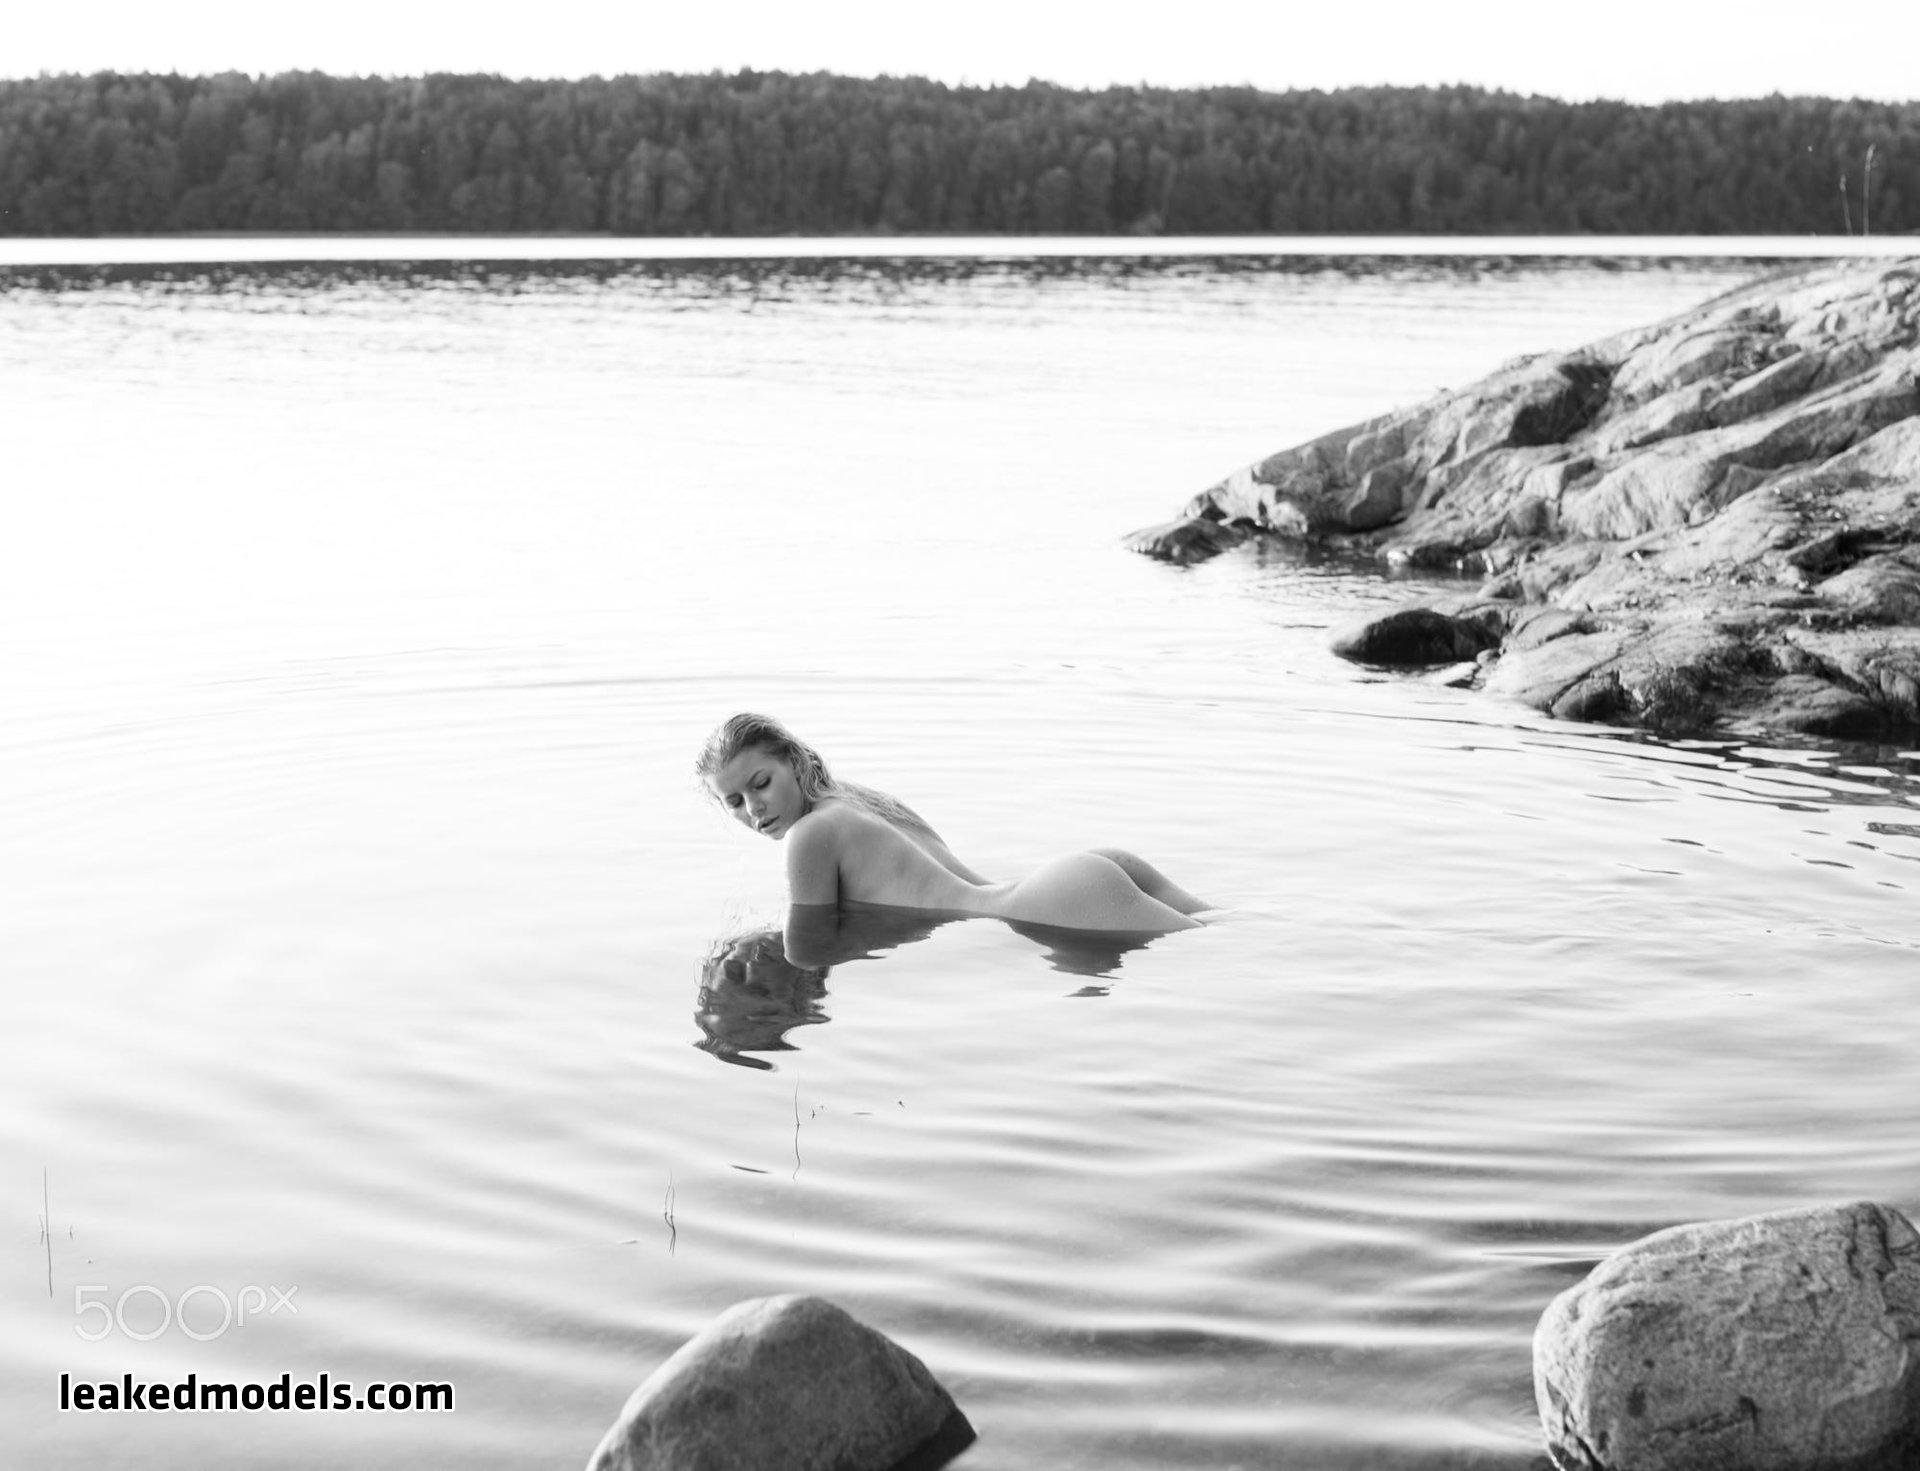 honeybabesugarpiie killeryina leaked nude leakedmodels.com 0030 - Viktoria – Honeybabesugarpiie killeryina OnlyFans Nude Leaks (30 Photos)